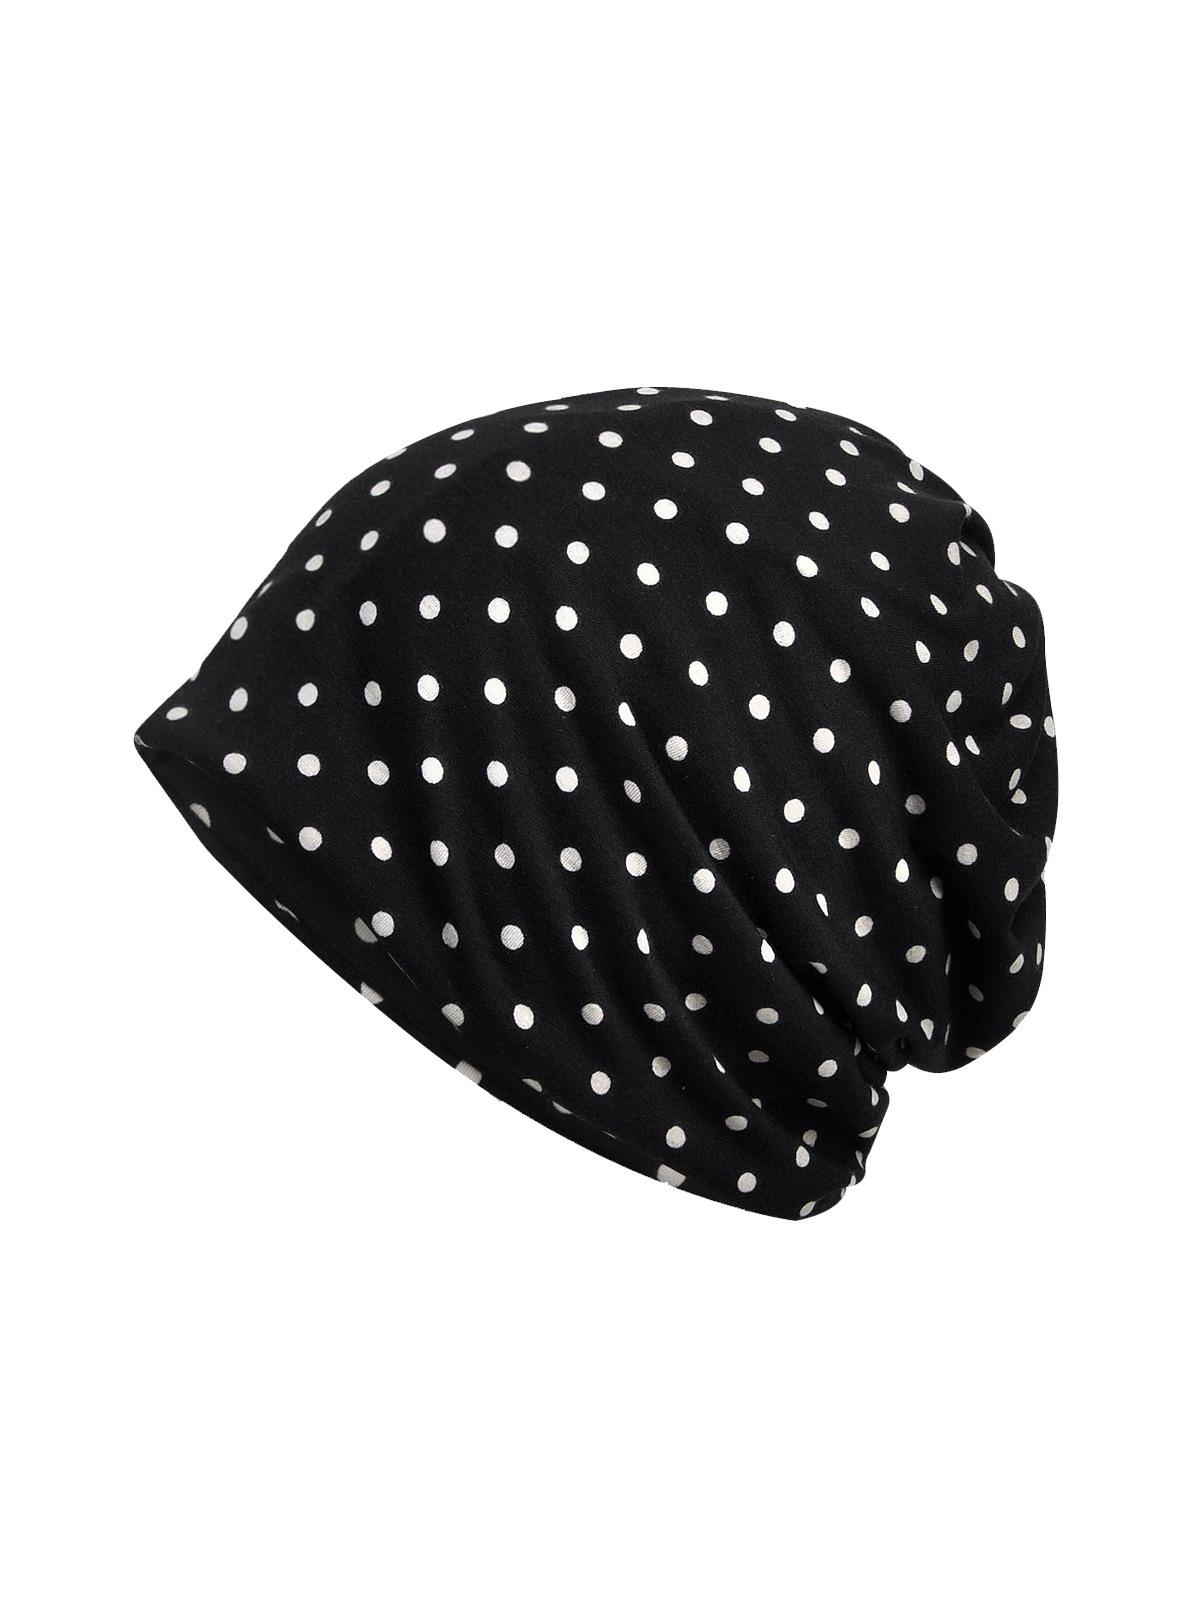 Hat And Neck Dual-Purpose Polka Dot Beanie Cap